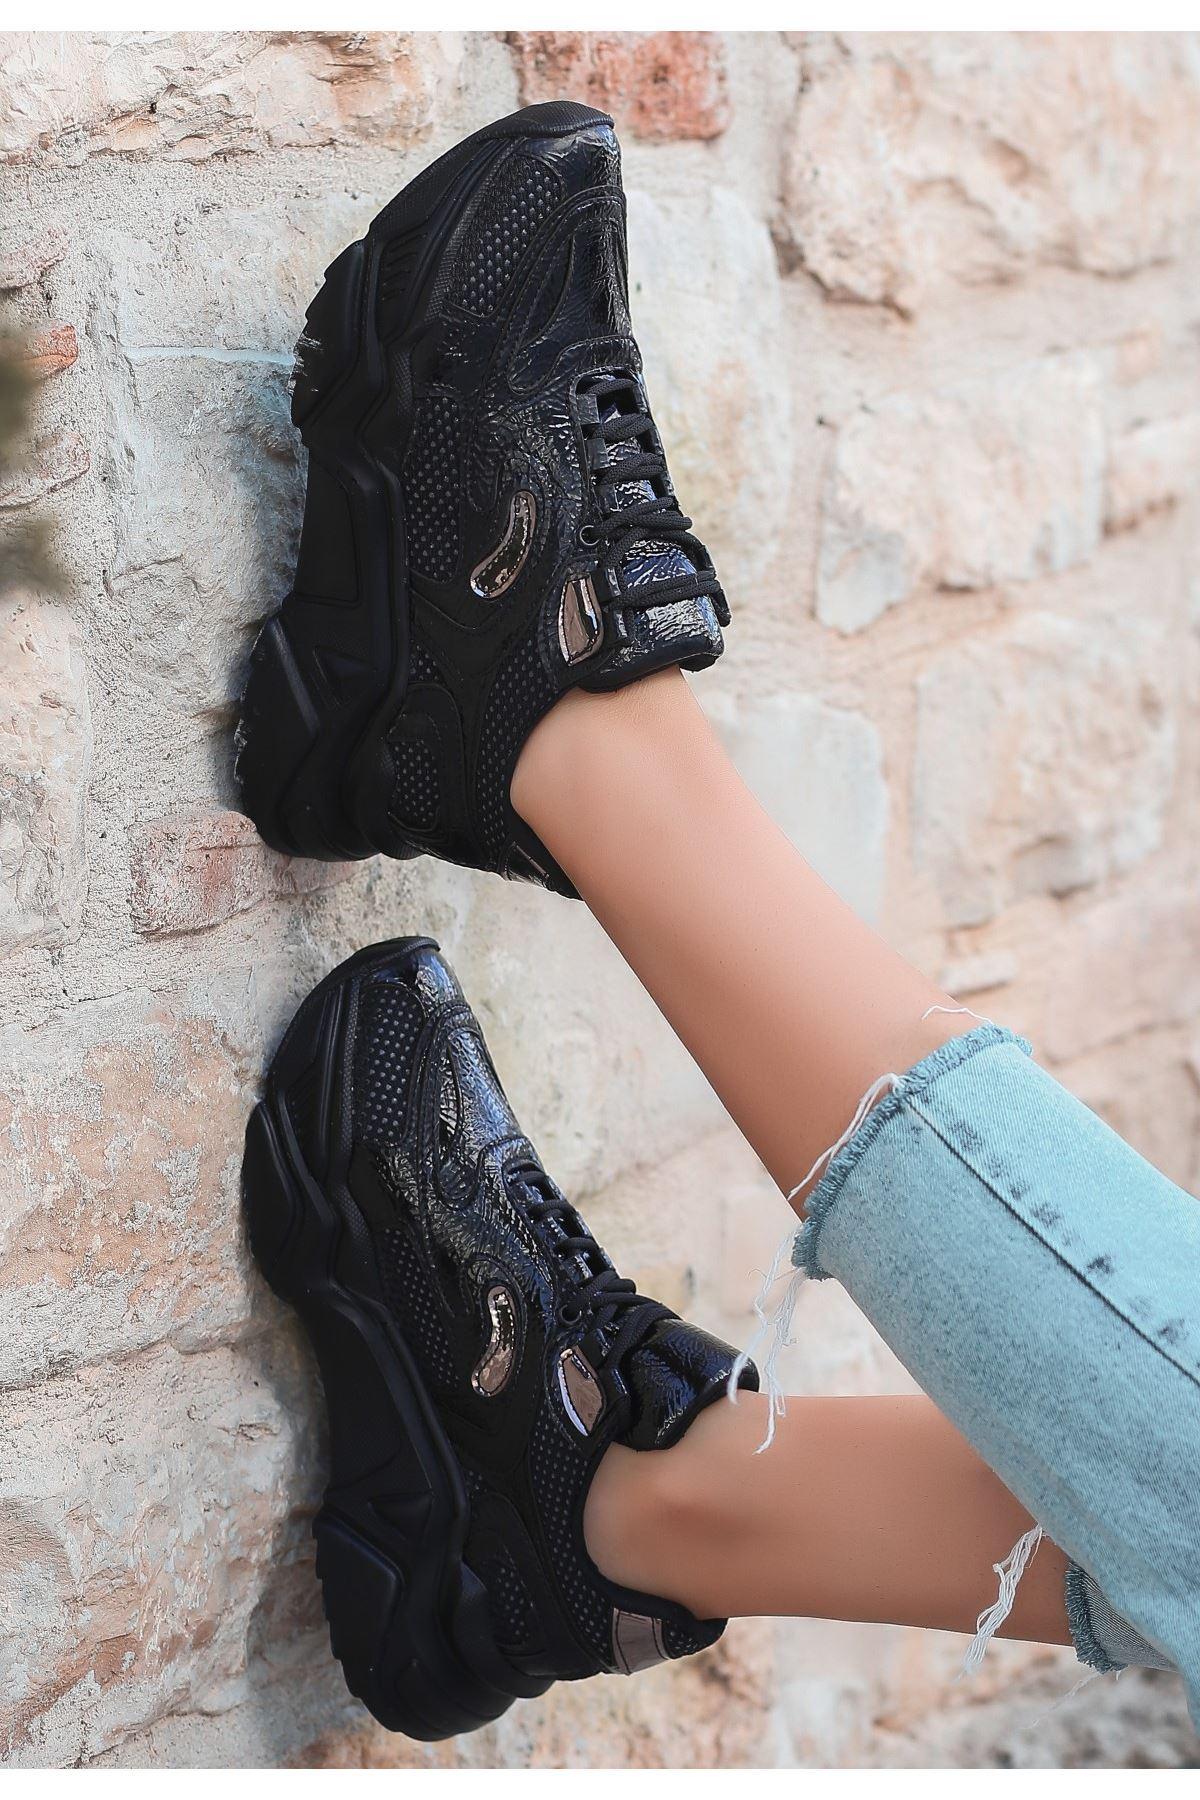 Irta Siyah Rugan Holoğramlı Spor Ayakkabı